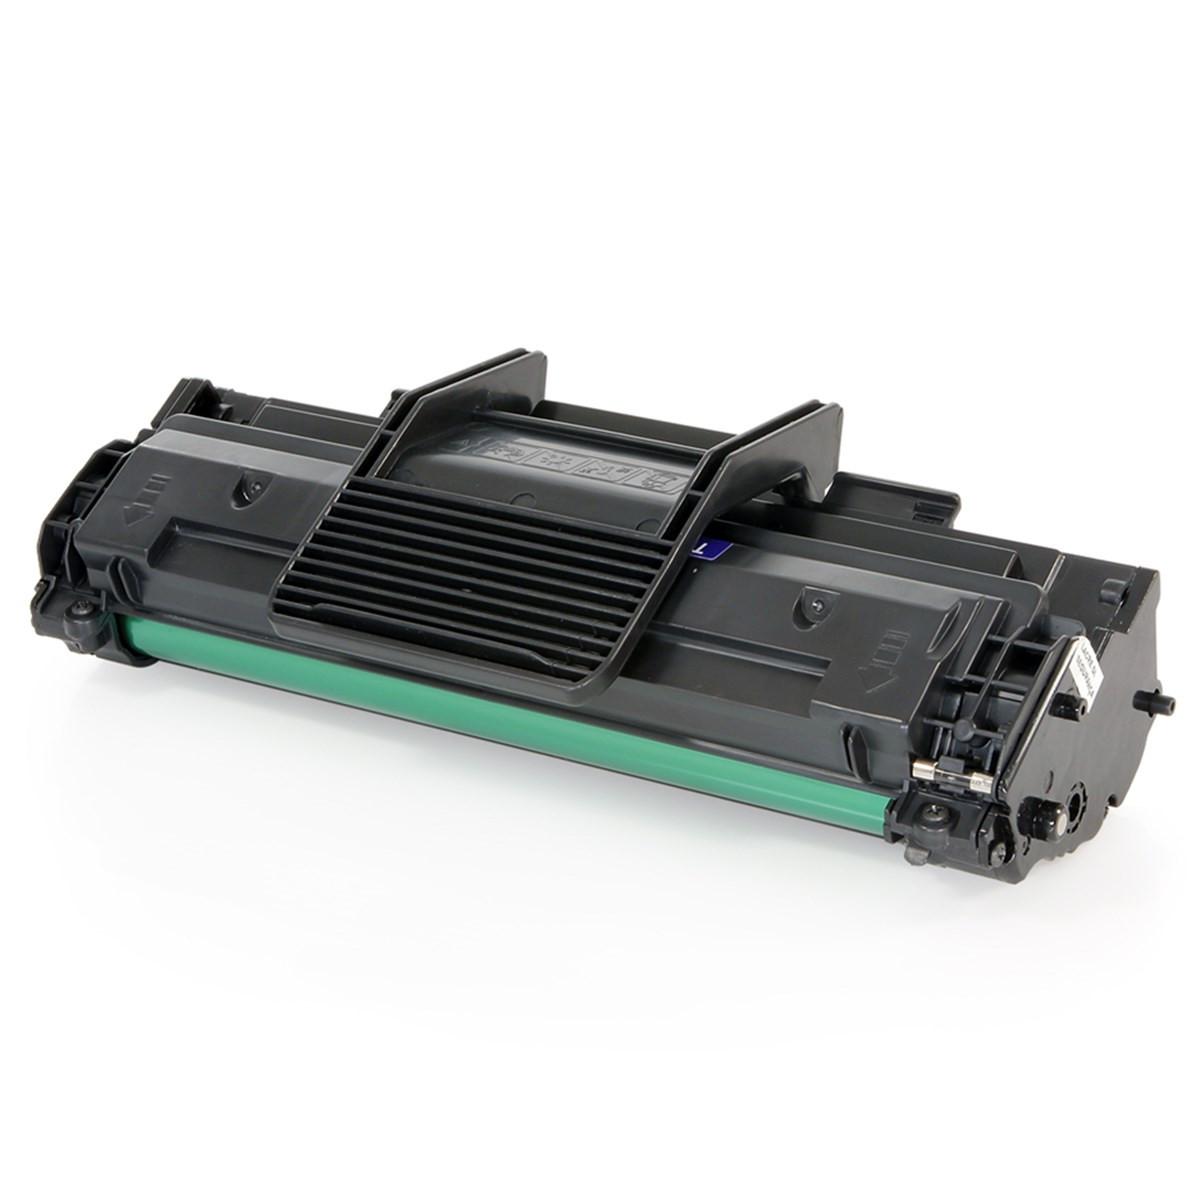 Toner Samsung ML1610D2 | ML1610 ML2010 ML2010P ML2510 ML2570 ML2571N | Katun Select 3k